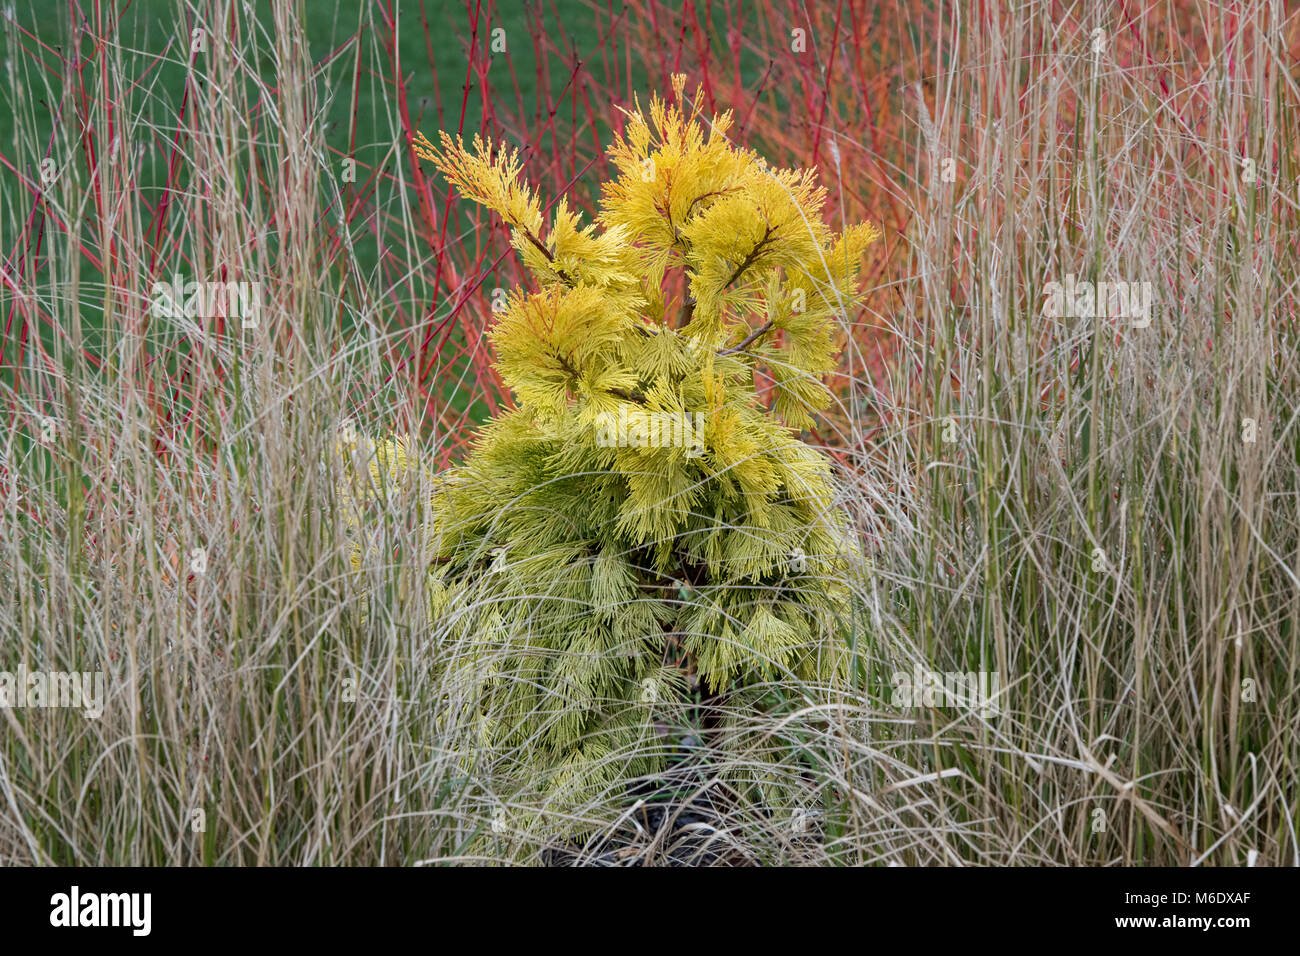 Calocedrus decurrens 'Berrima Gold'. Incense cedar 'Berrima Gold. Slow growing columnar conifer tree. UK - Stock Image